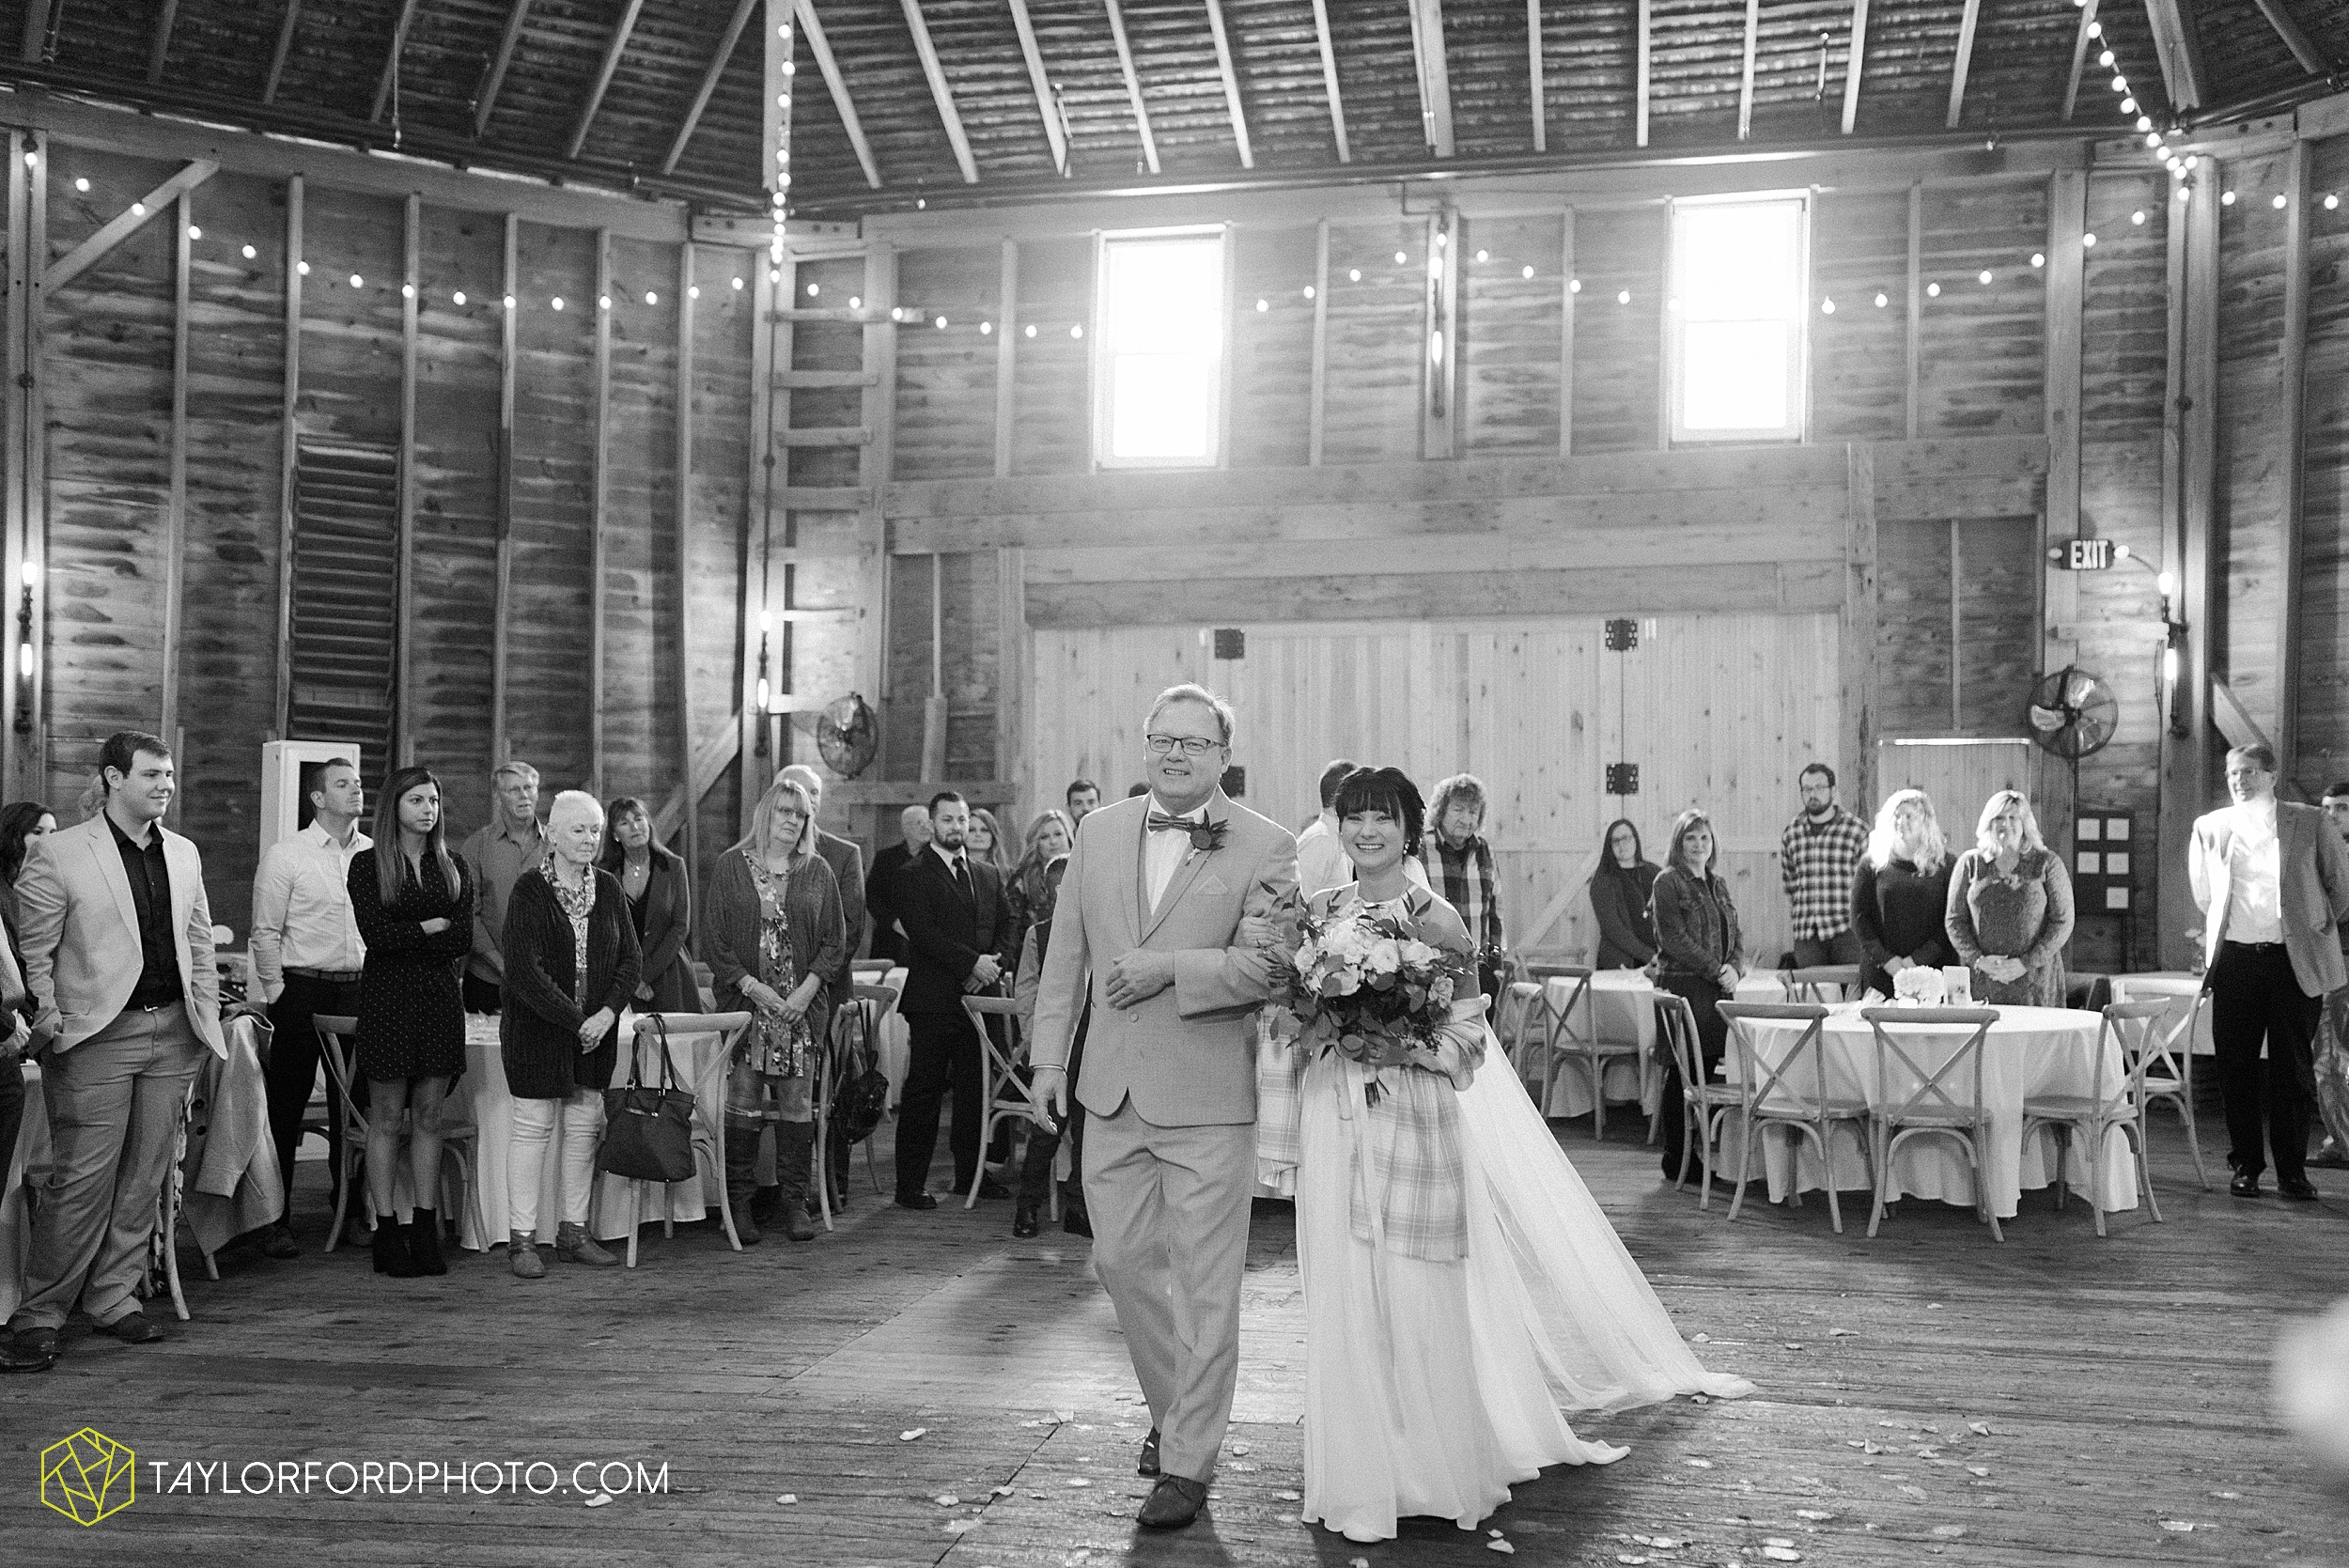 marissa-nicole-nick-daeger-orrmont-estate-farm-wedding-piqua-dayton-troy-ohio-fall-photographer-taylor-ford-photography_1525.jpg